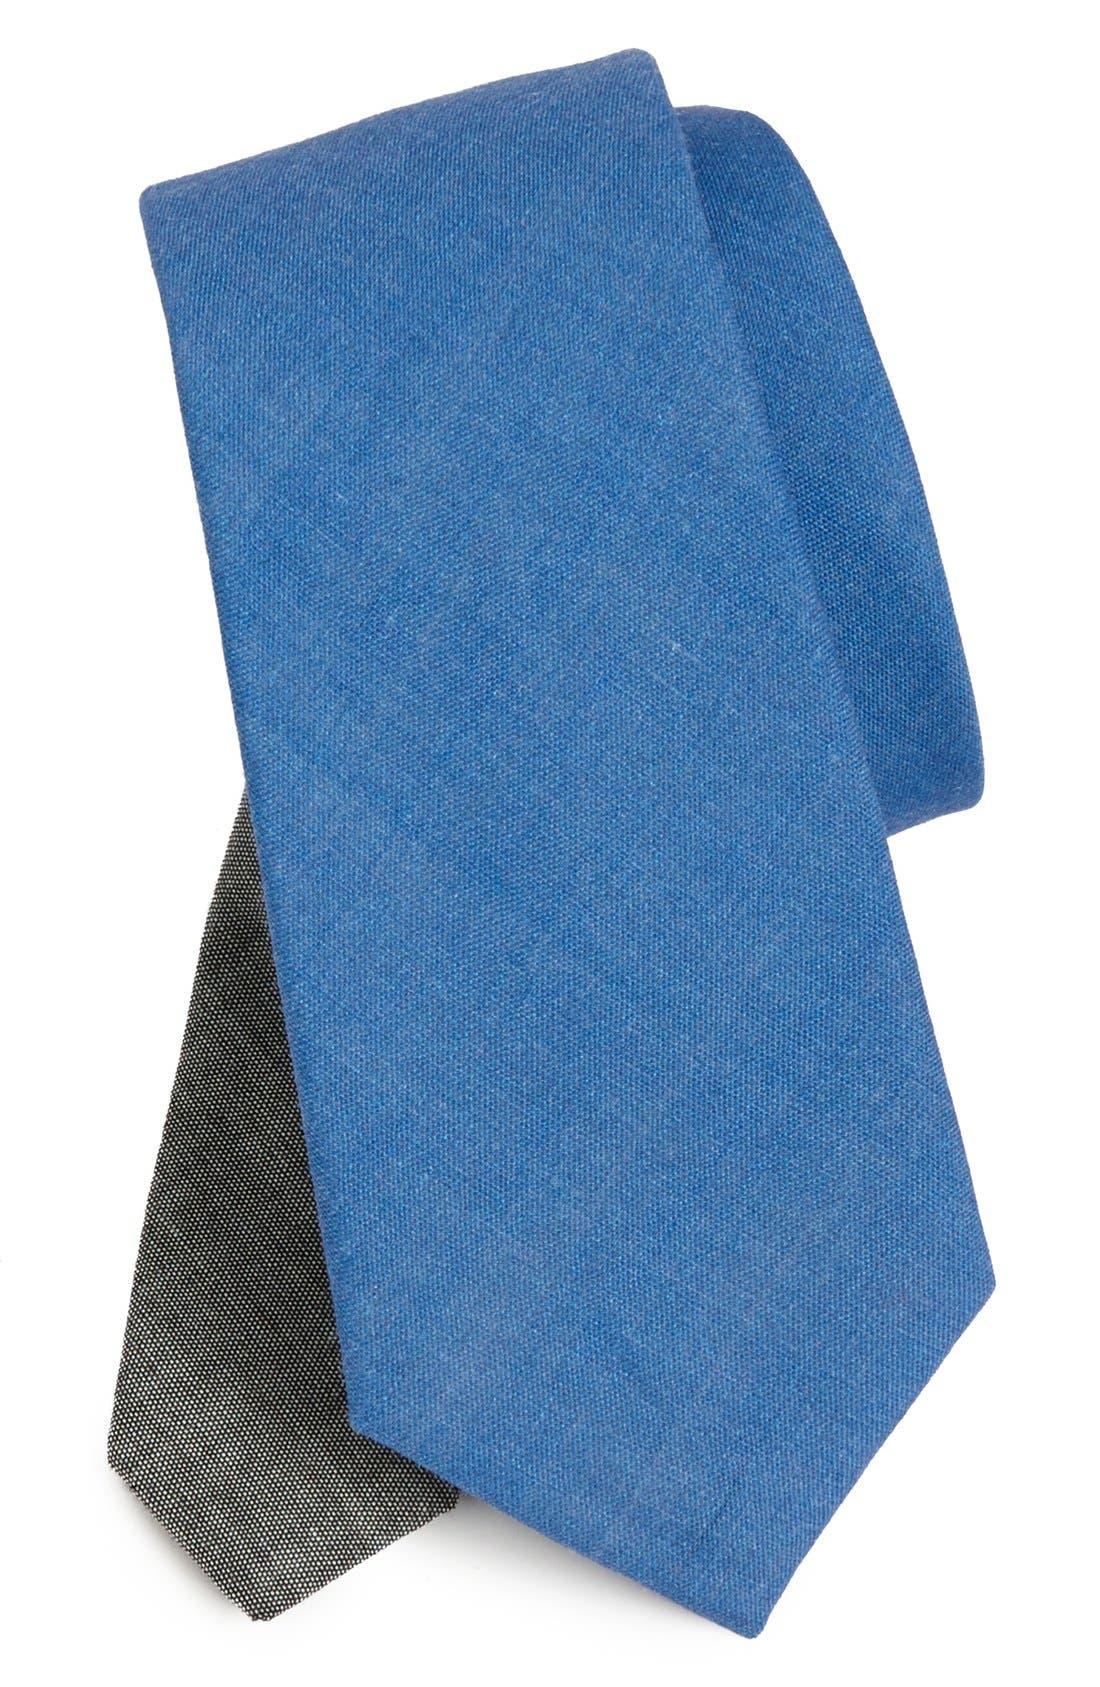 Main Image - EDIT by The Tie Bar Solid Linen Tie (Nordstrom Exclusive)